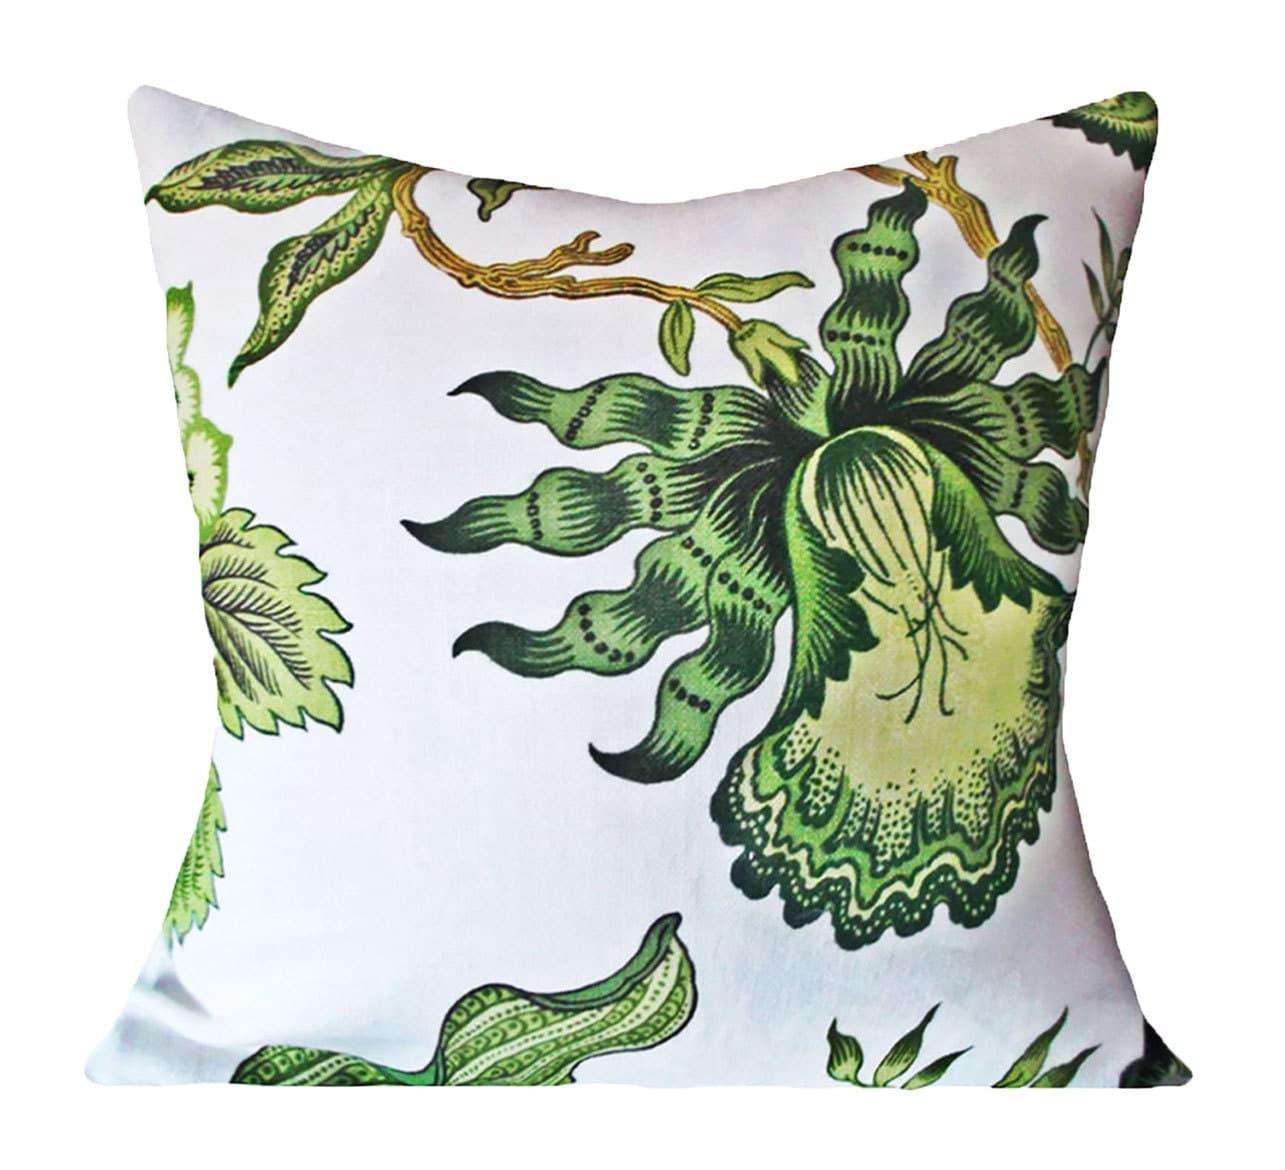 Schumacher Hothouse Flowers Verdance Decorative Pillow Cover